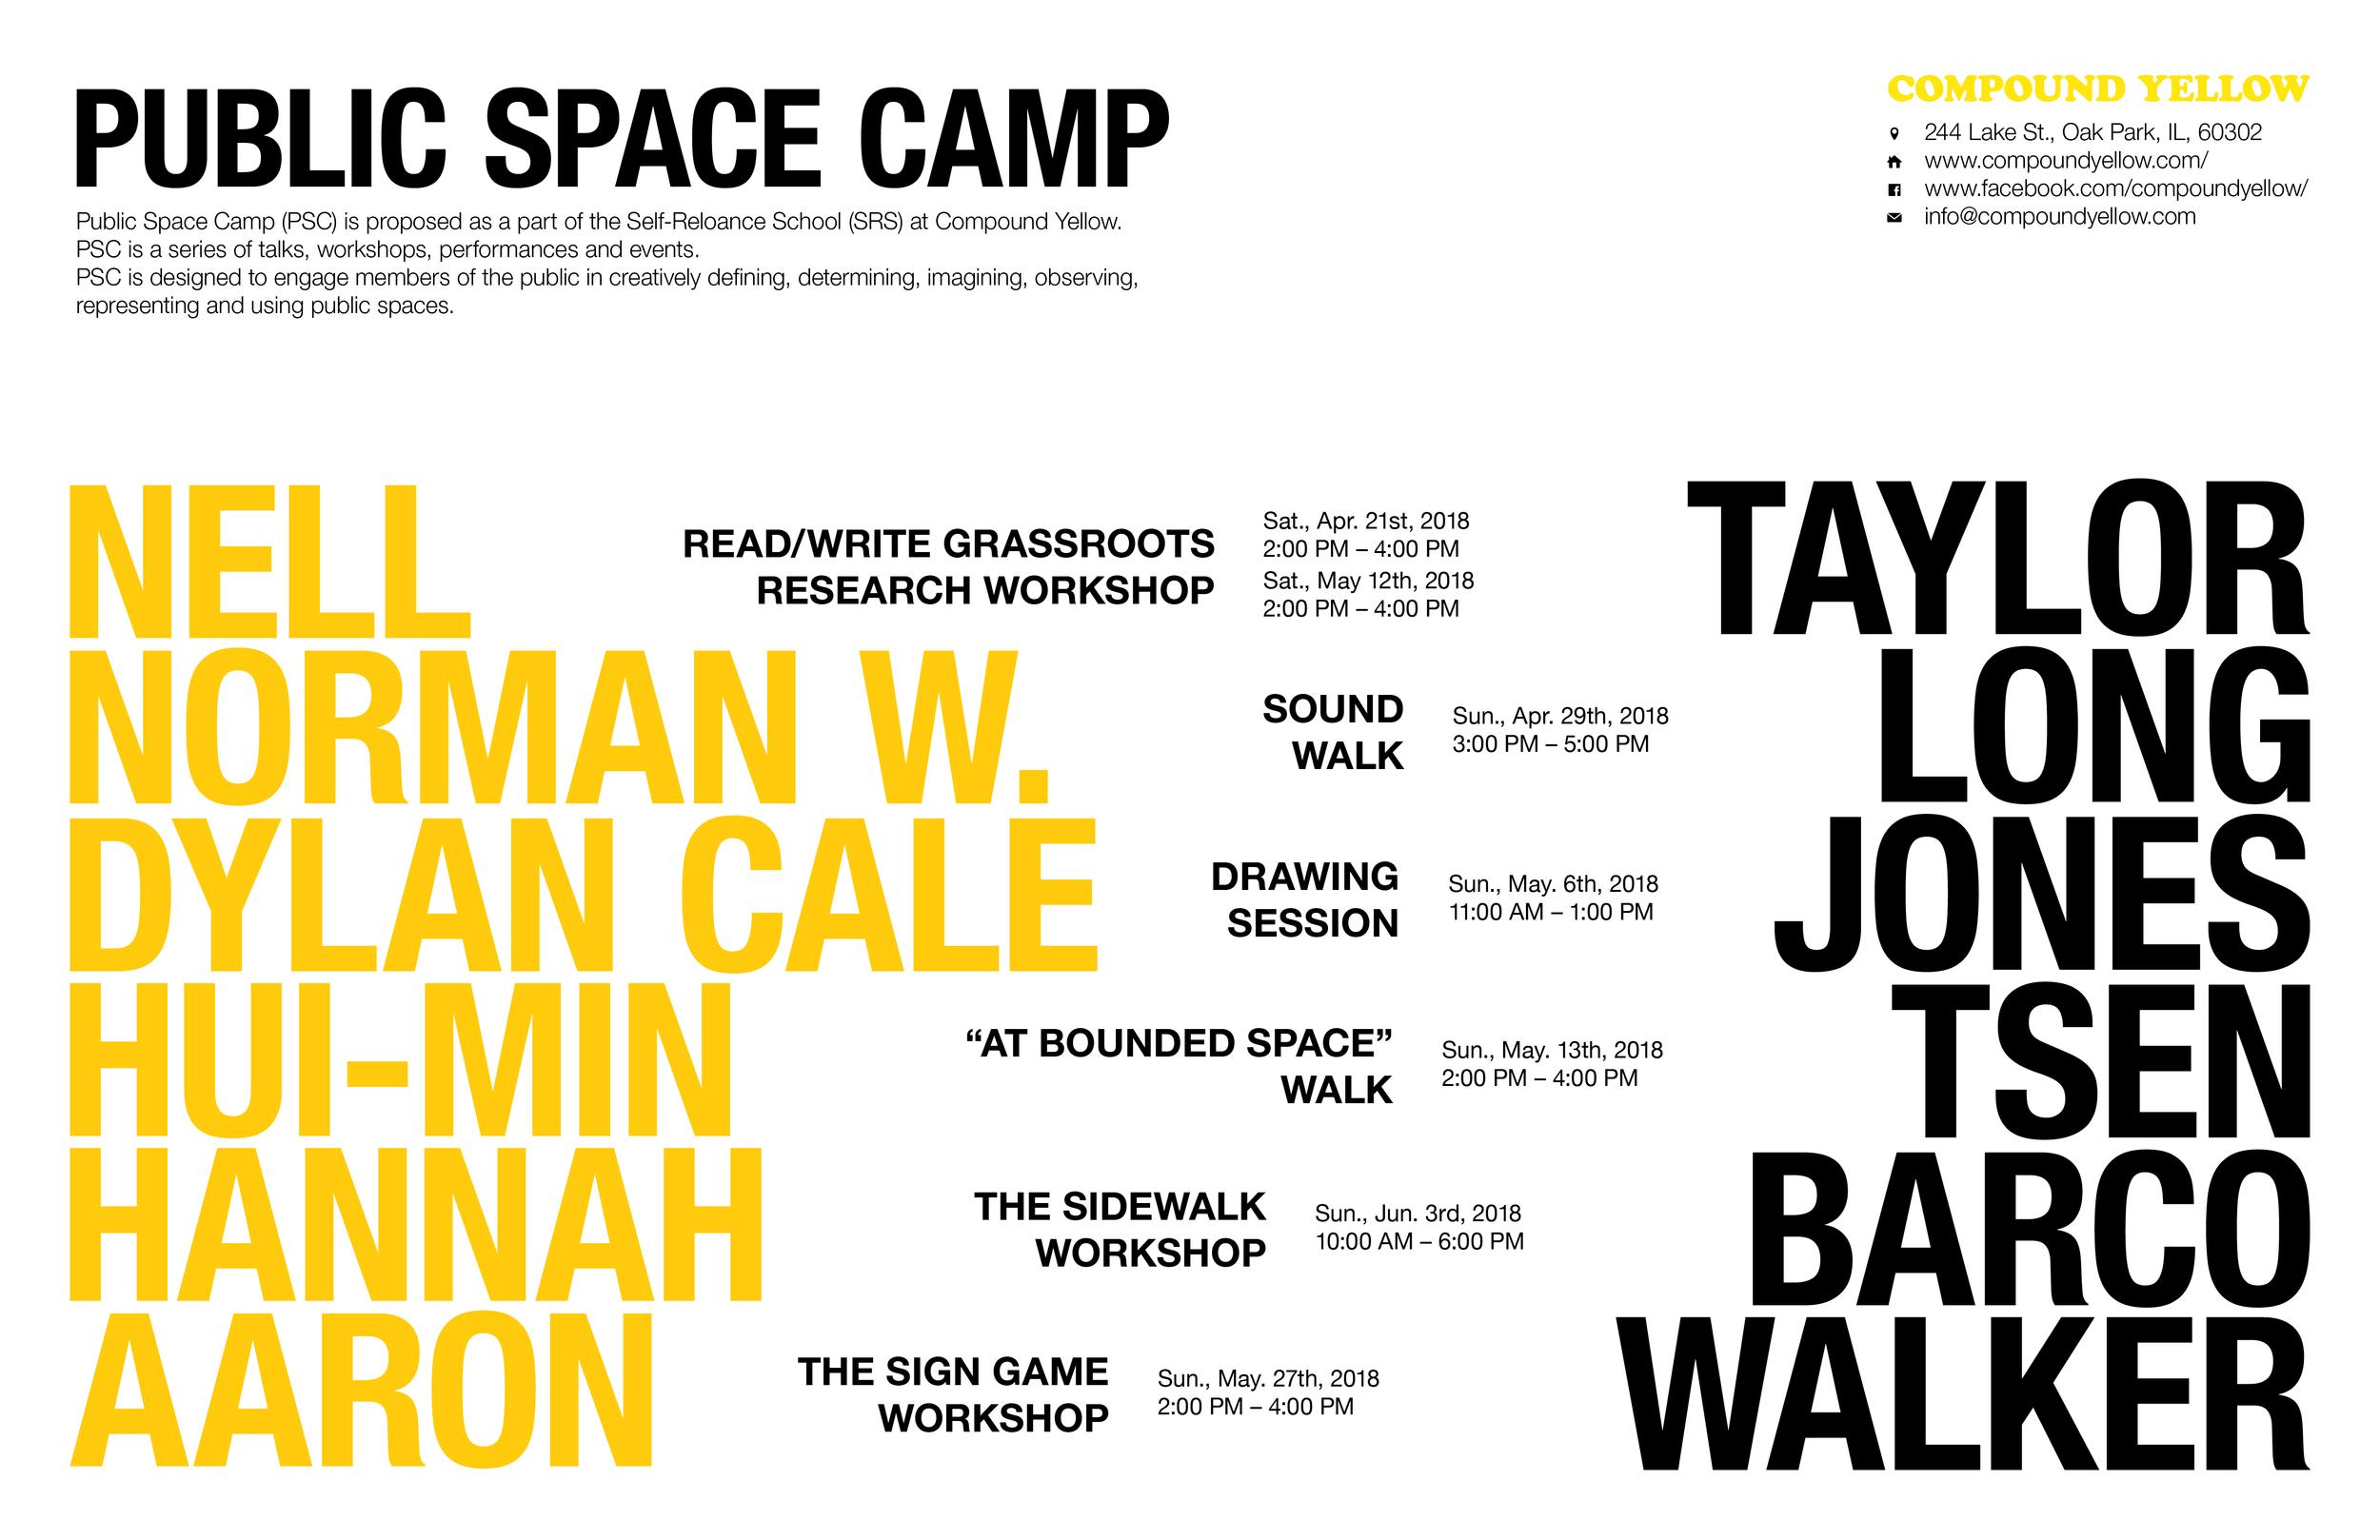 Public Space Camp Poster FinalFINAL.png